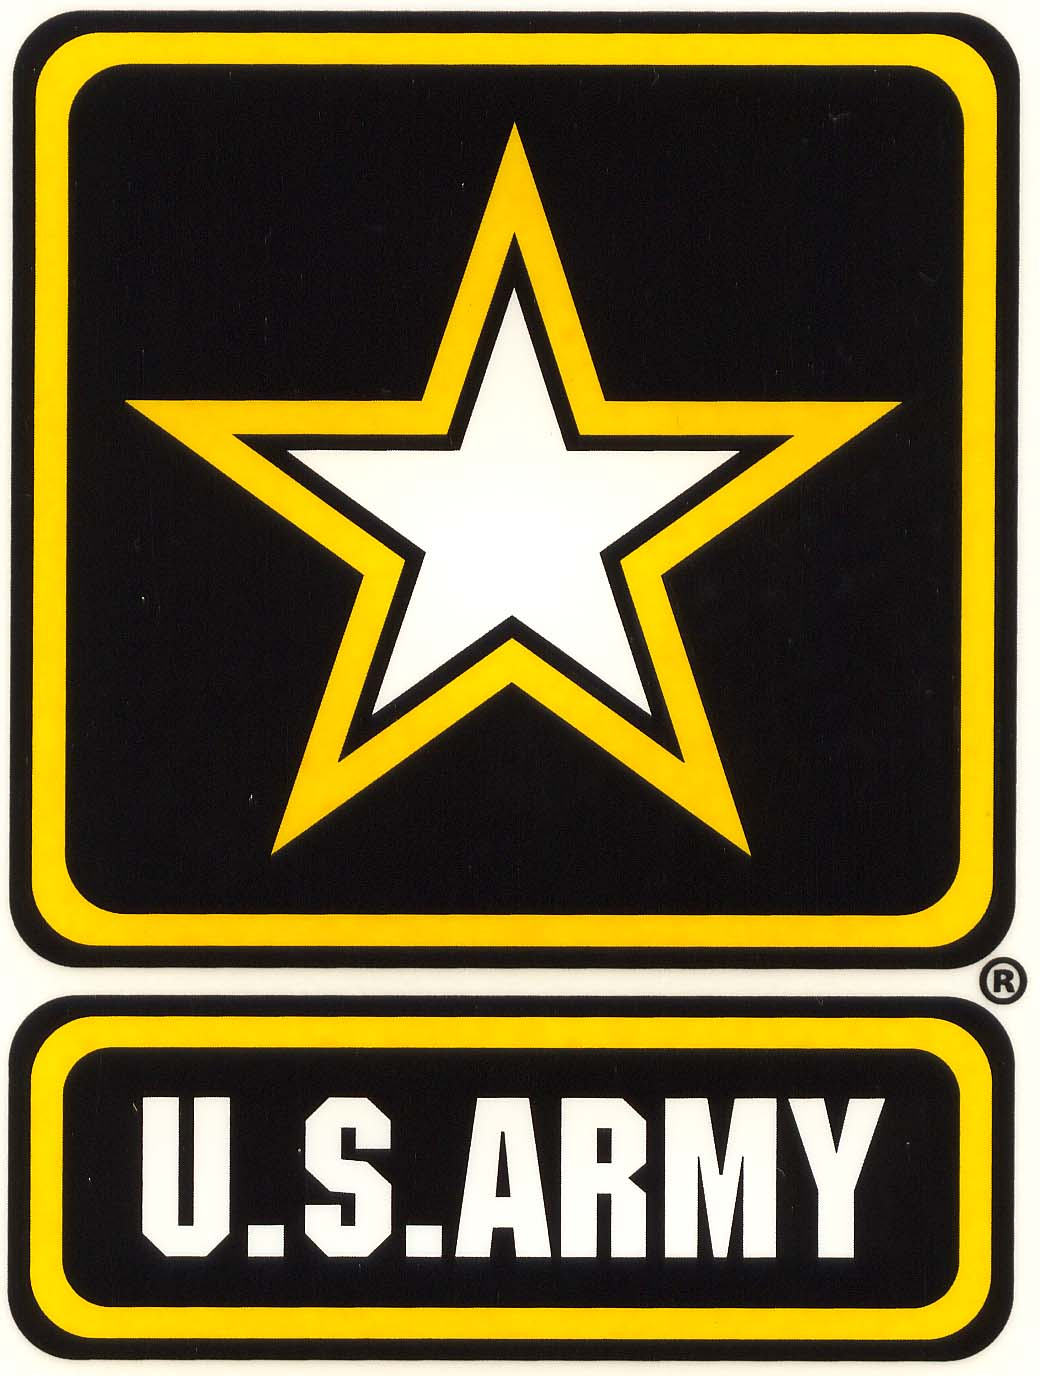 Free army clipart. Military clip art clipartix